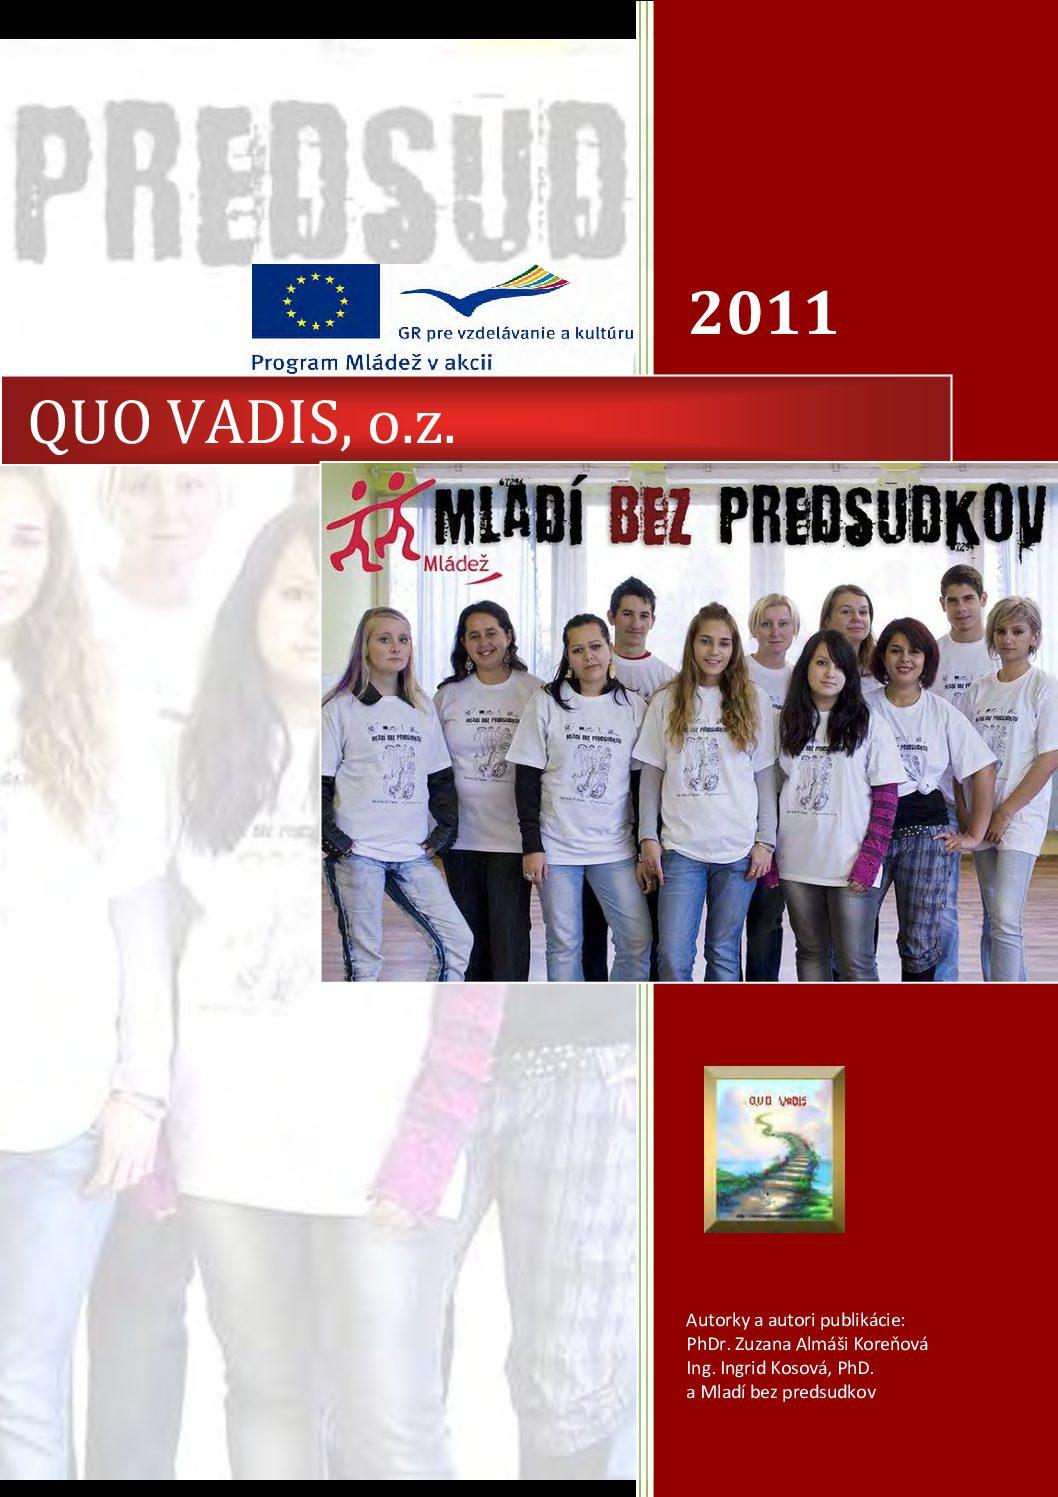 mladi bez predsudkov pdf